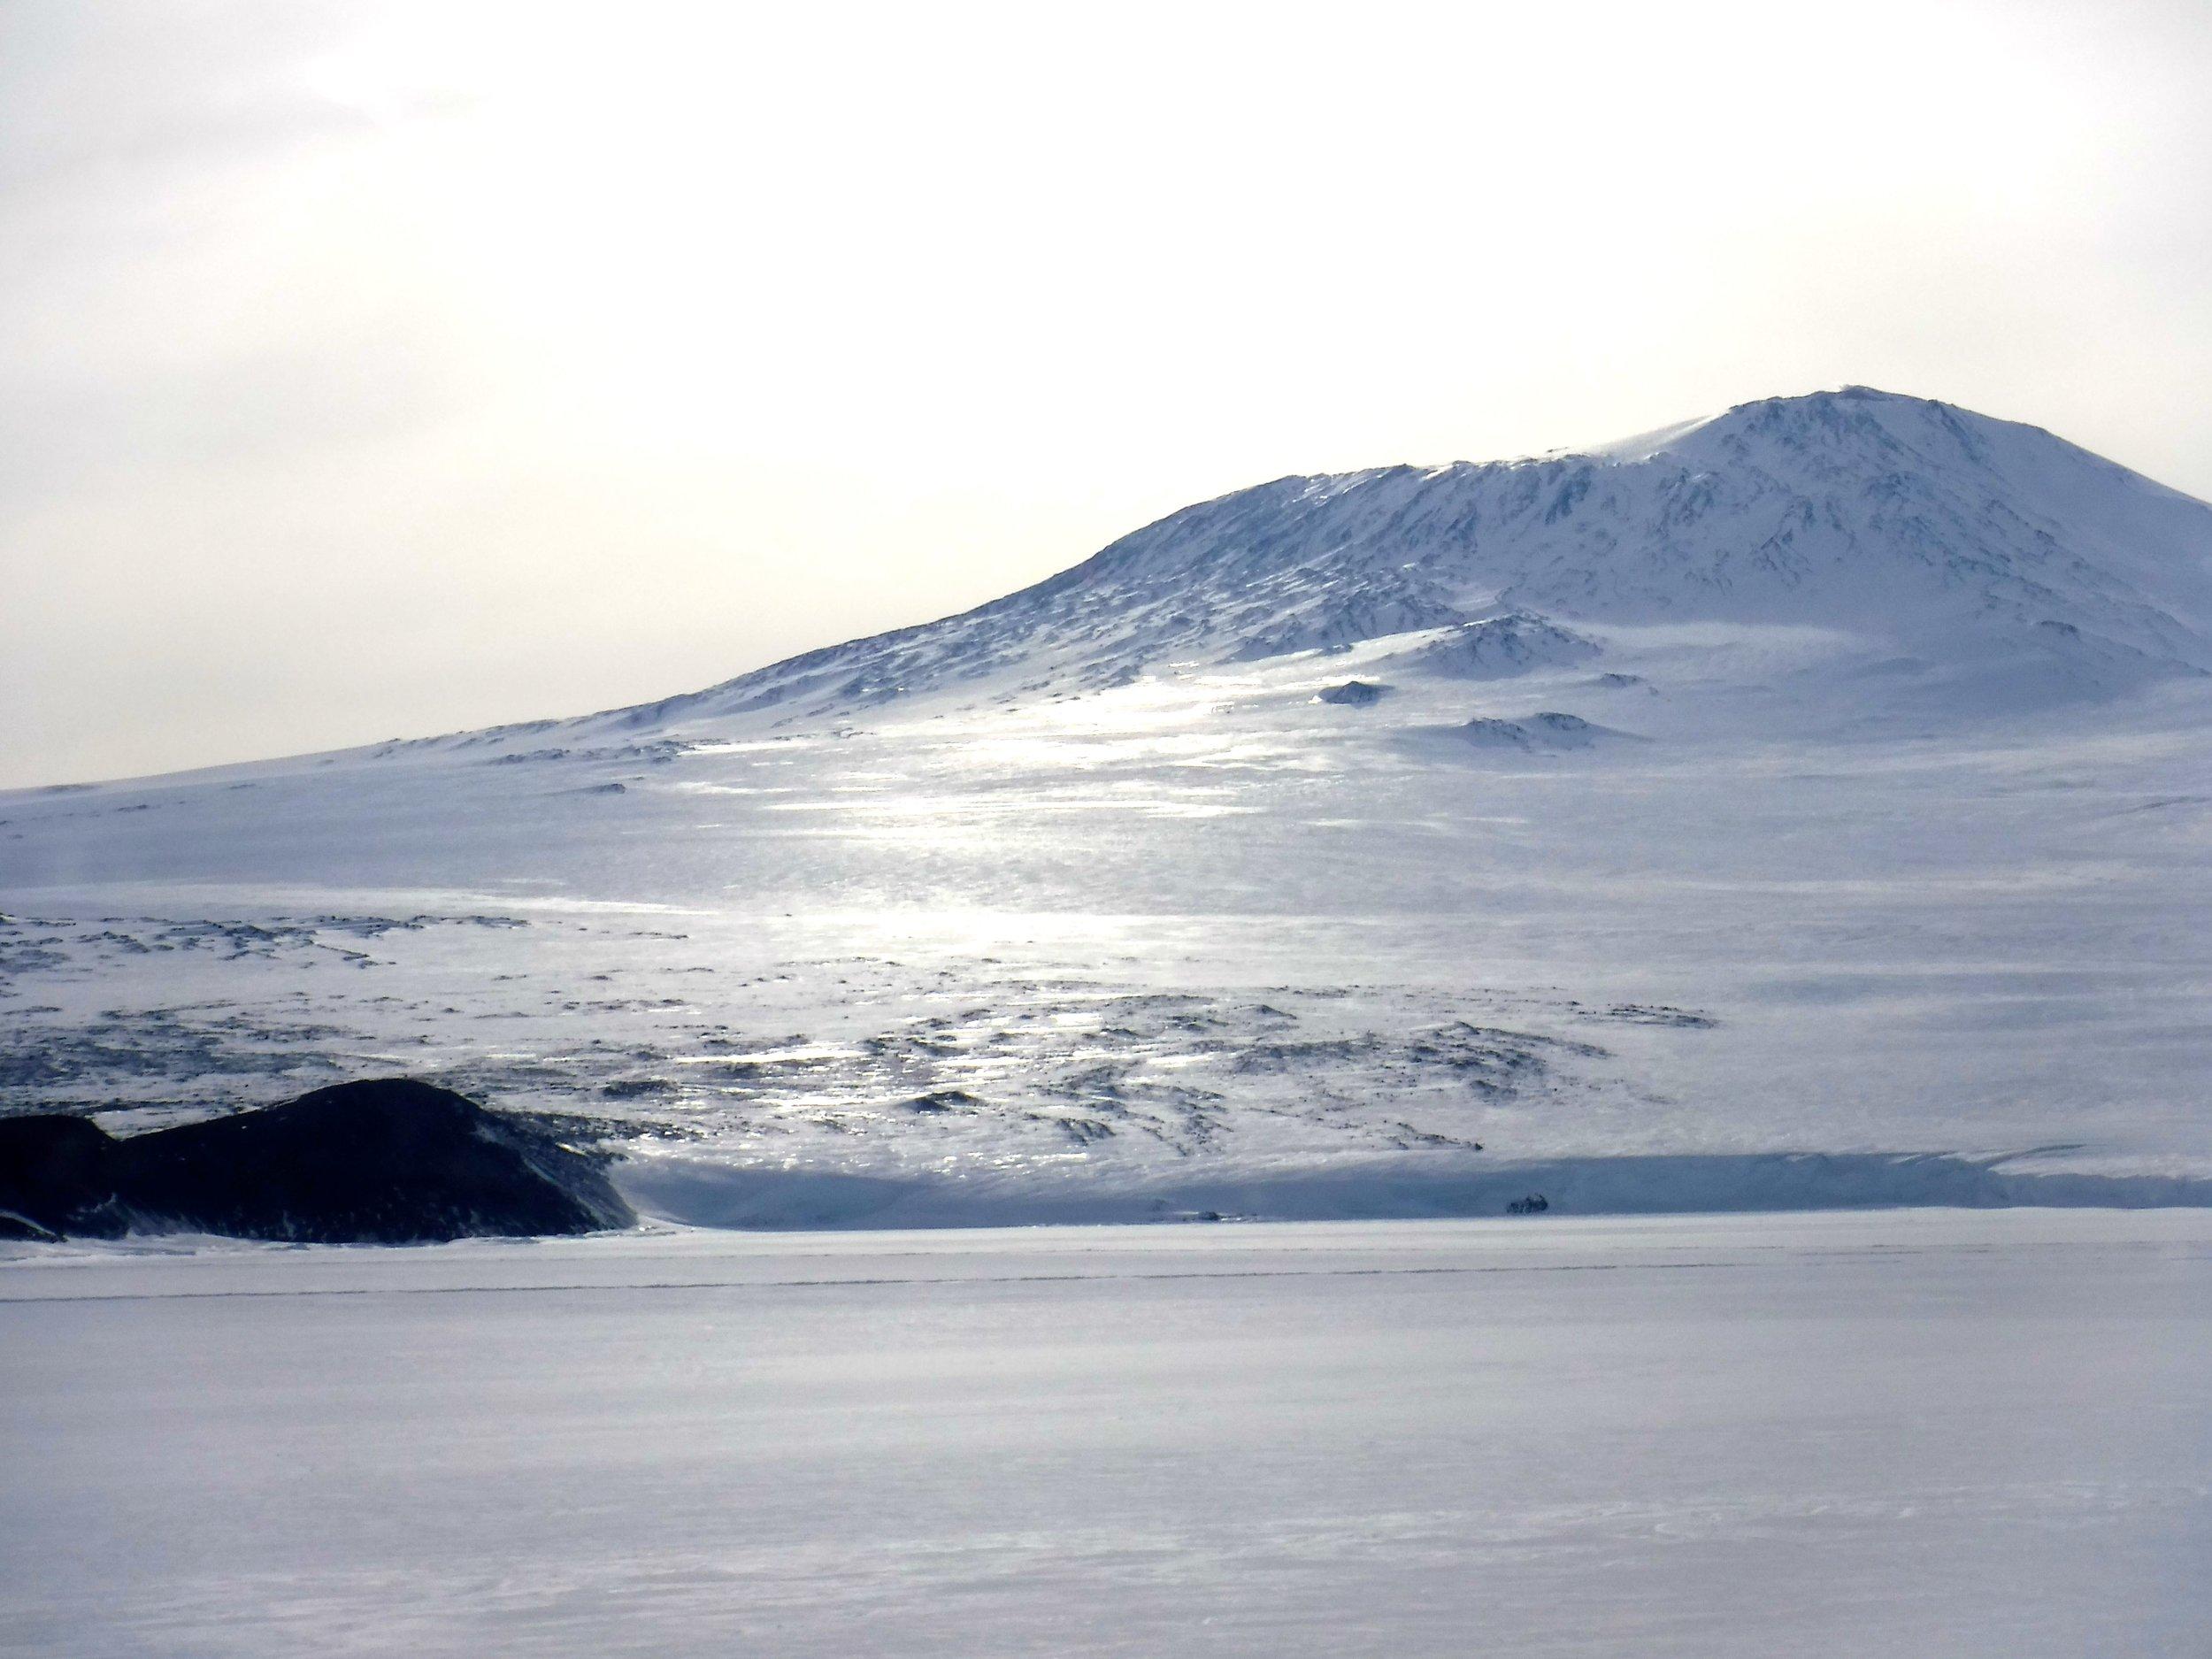 Mount Erebus. Photo credit: Caitlin Scarano.